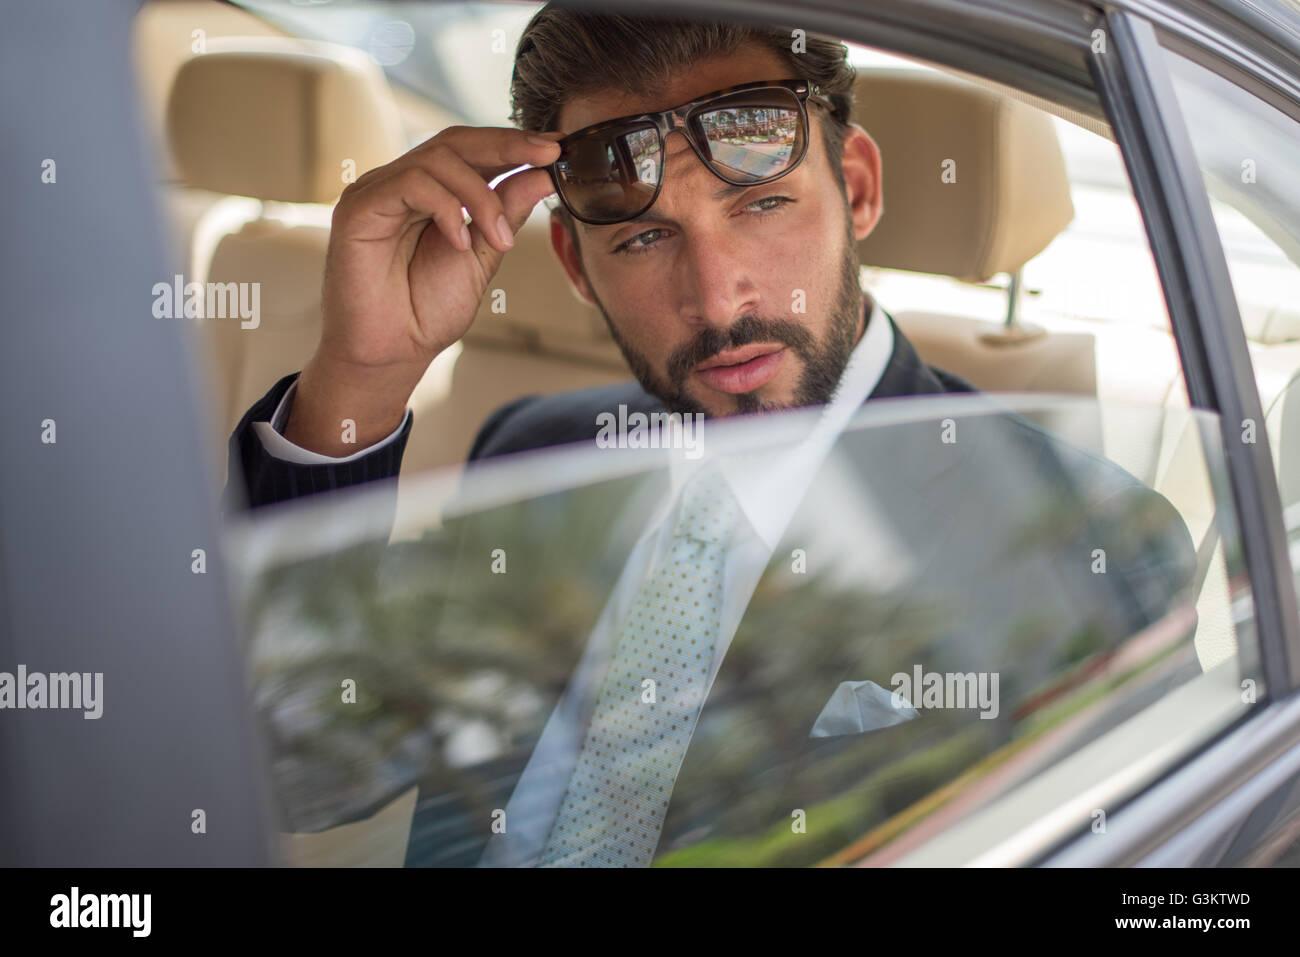 446a4f2992 Joven empresario sosteniendo gafas de sol en coche backseat, Dubai,  Emiratos Árabes Unidos.